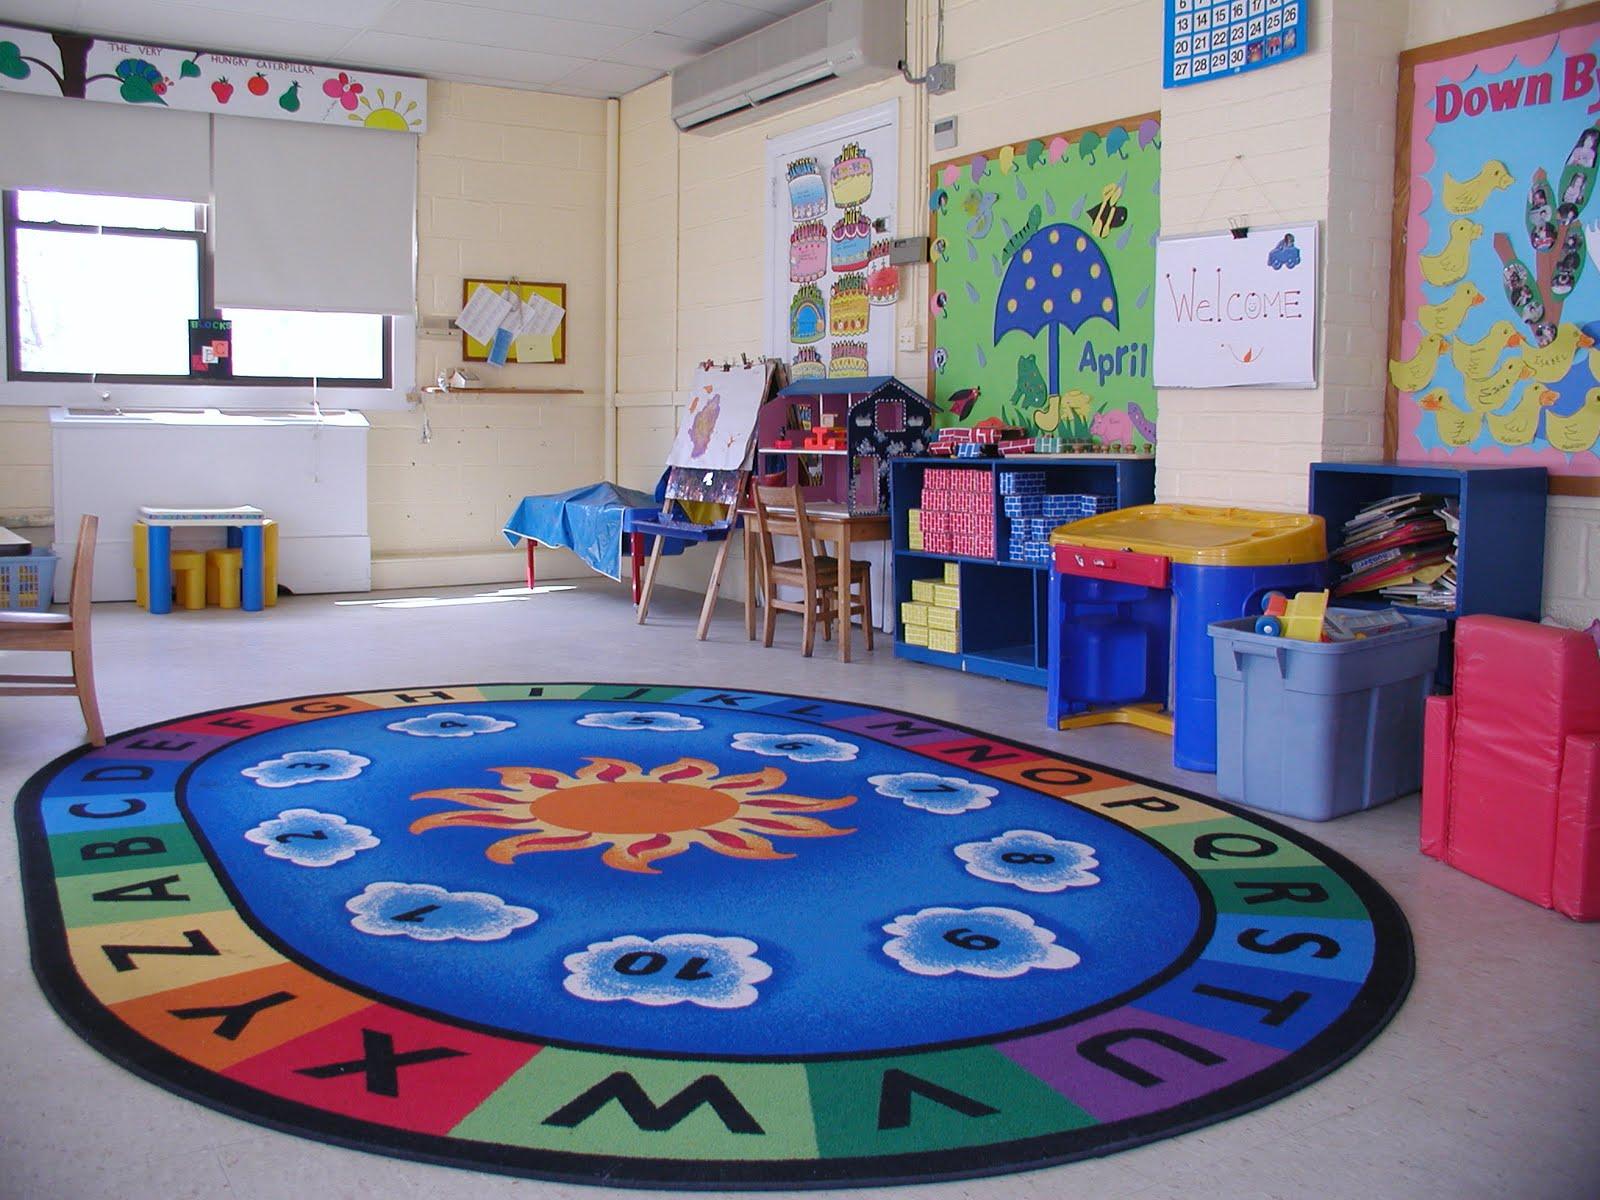 Kindergarten Class: SAN ISIDRO INTEGRATED SCHOOL: TRIP To BOHOL A HUGE SUCCESS